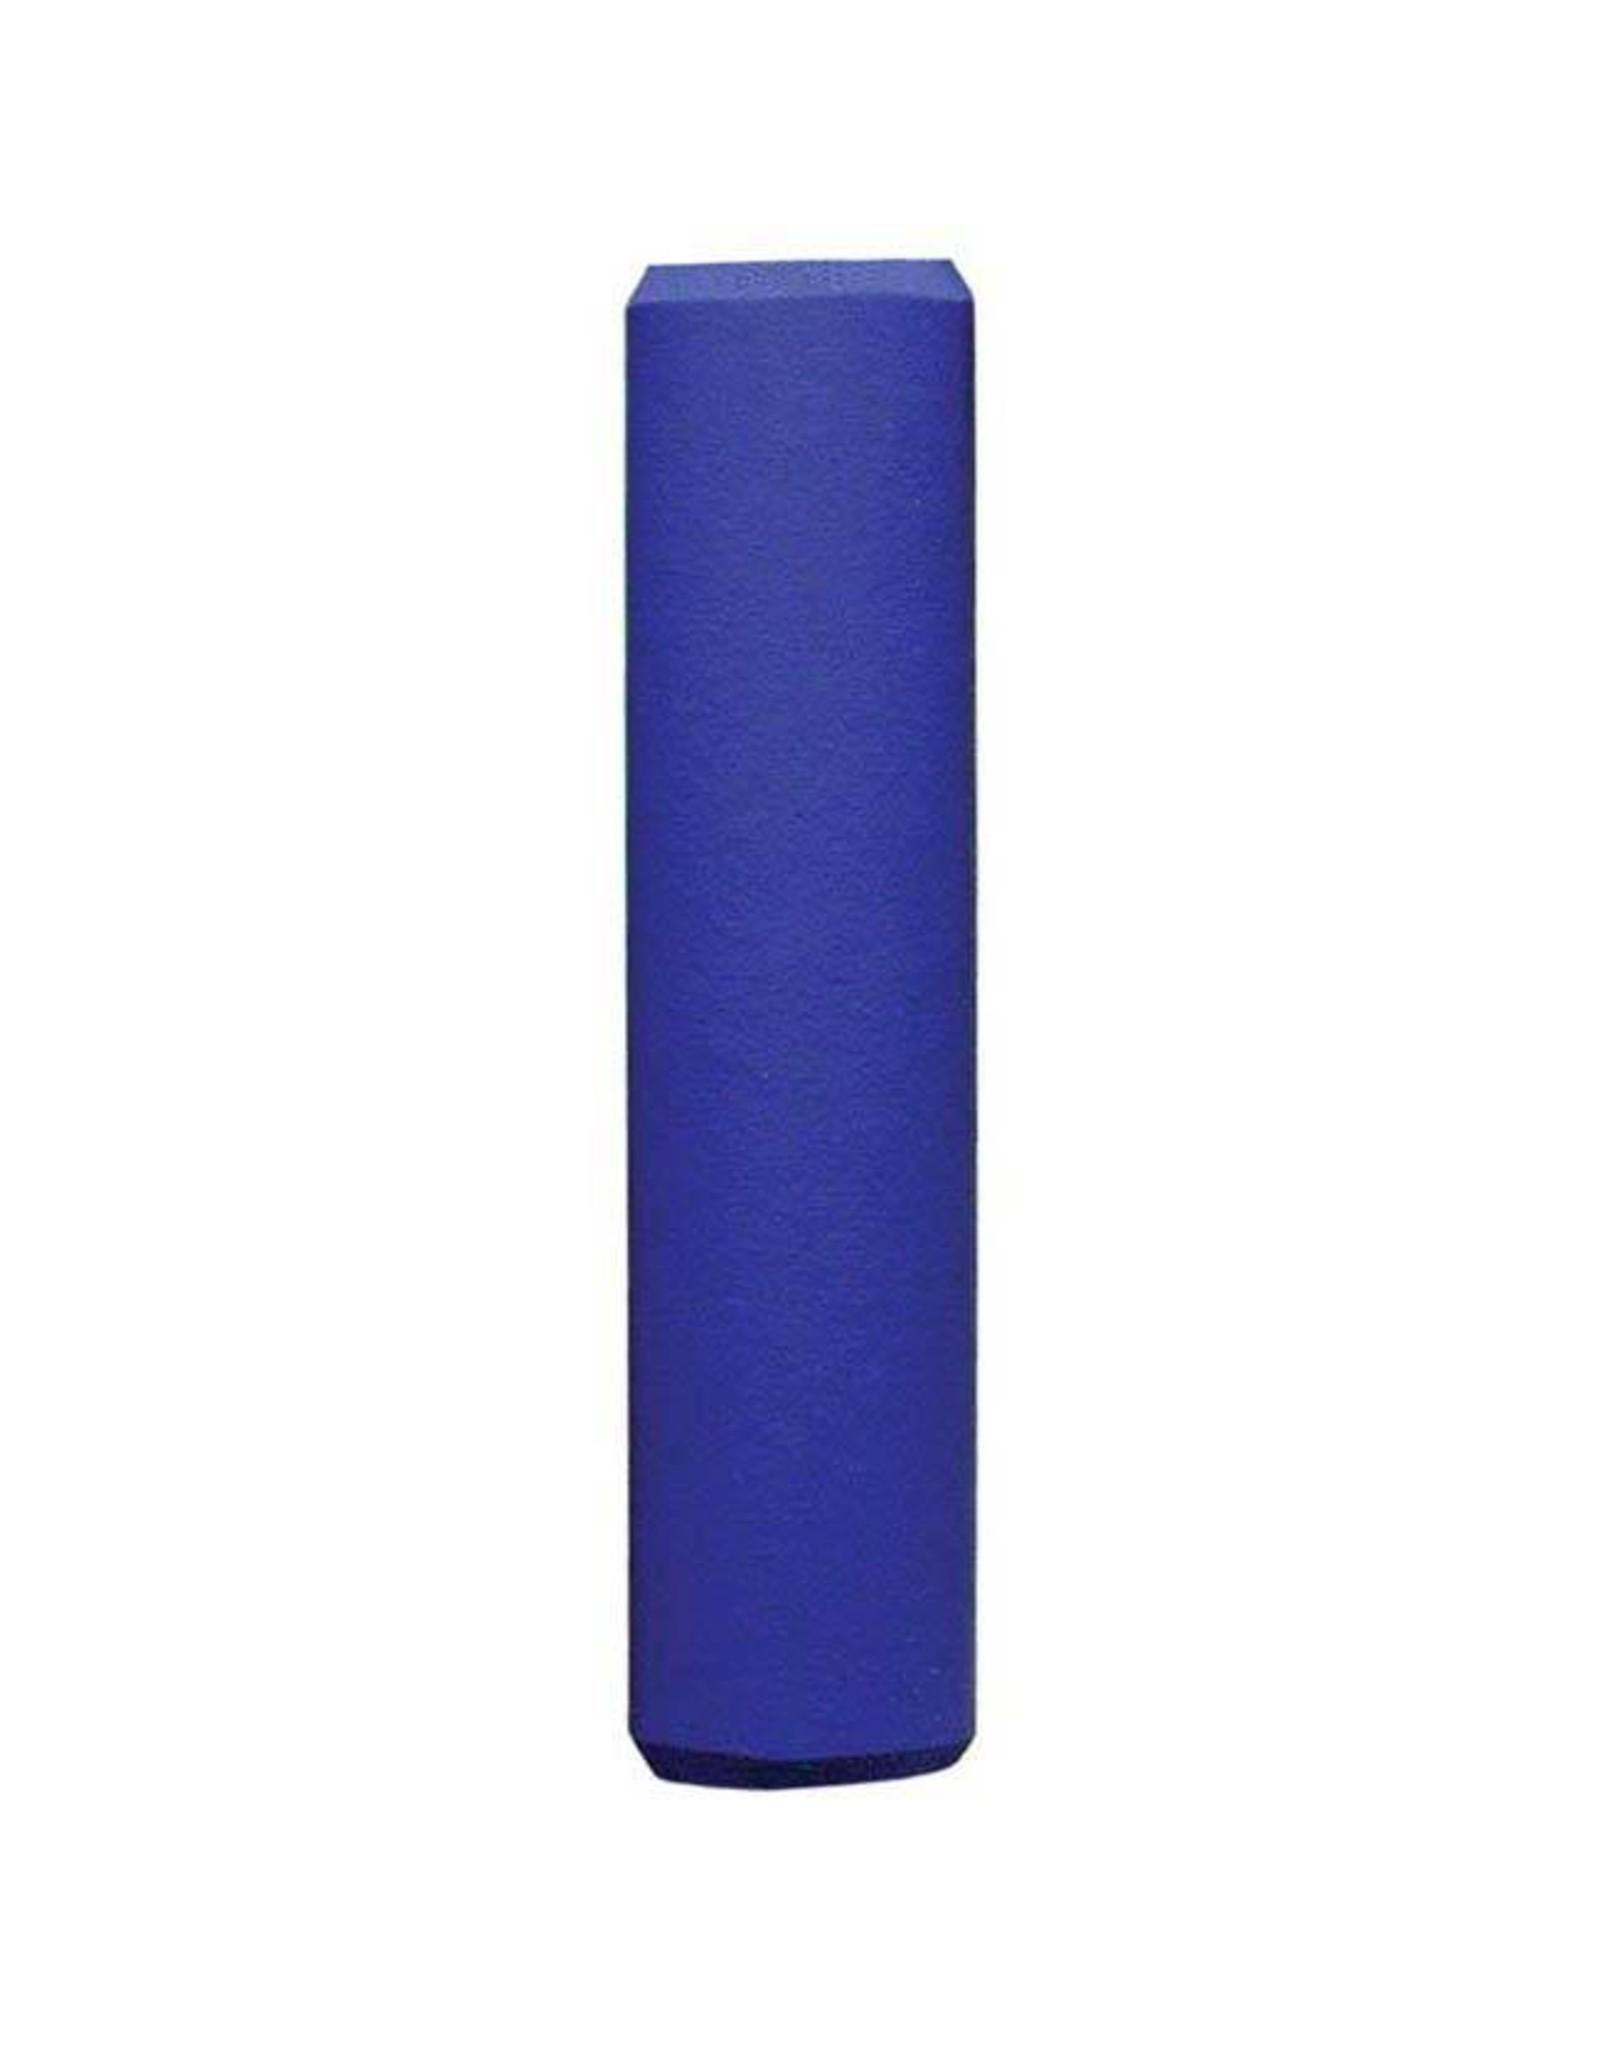 ESI ESI 32mm Chunky Silicone Grips: Blue